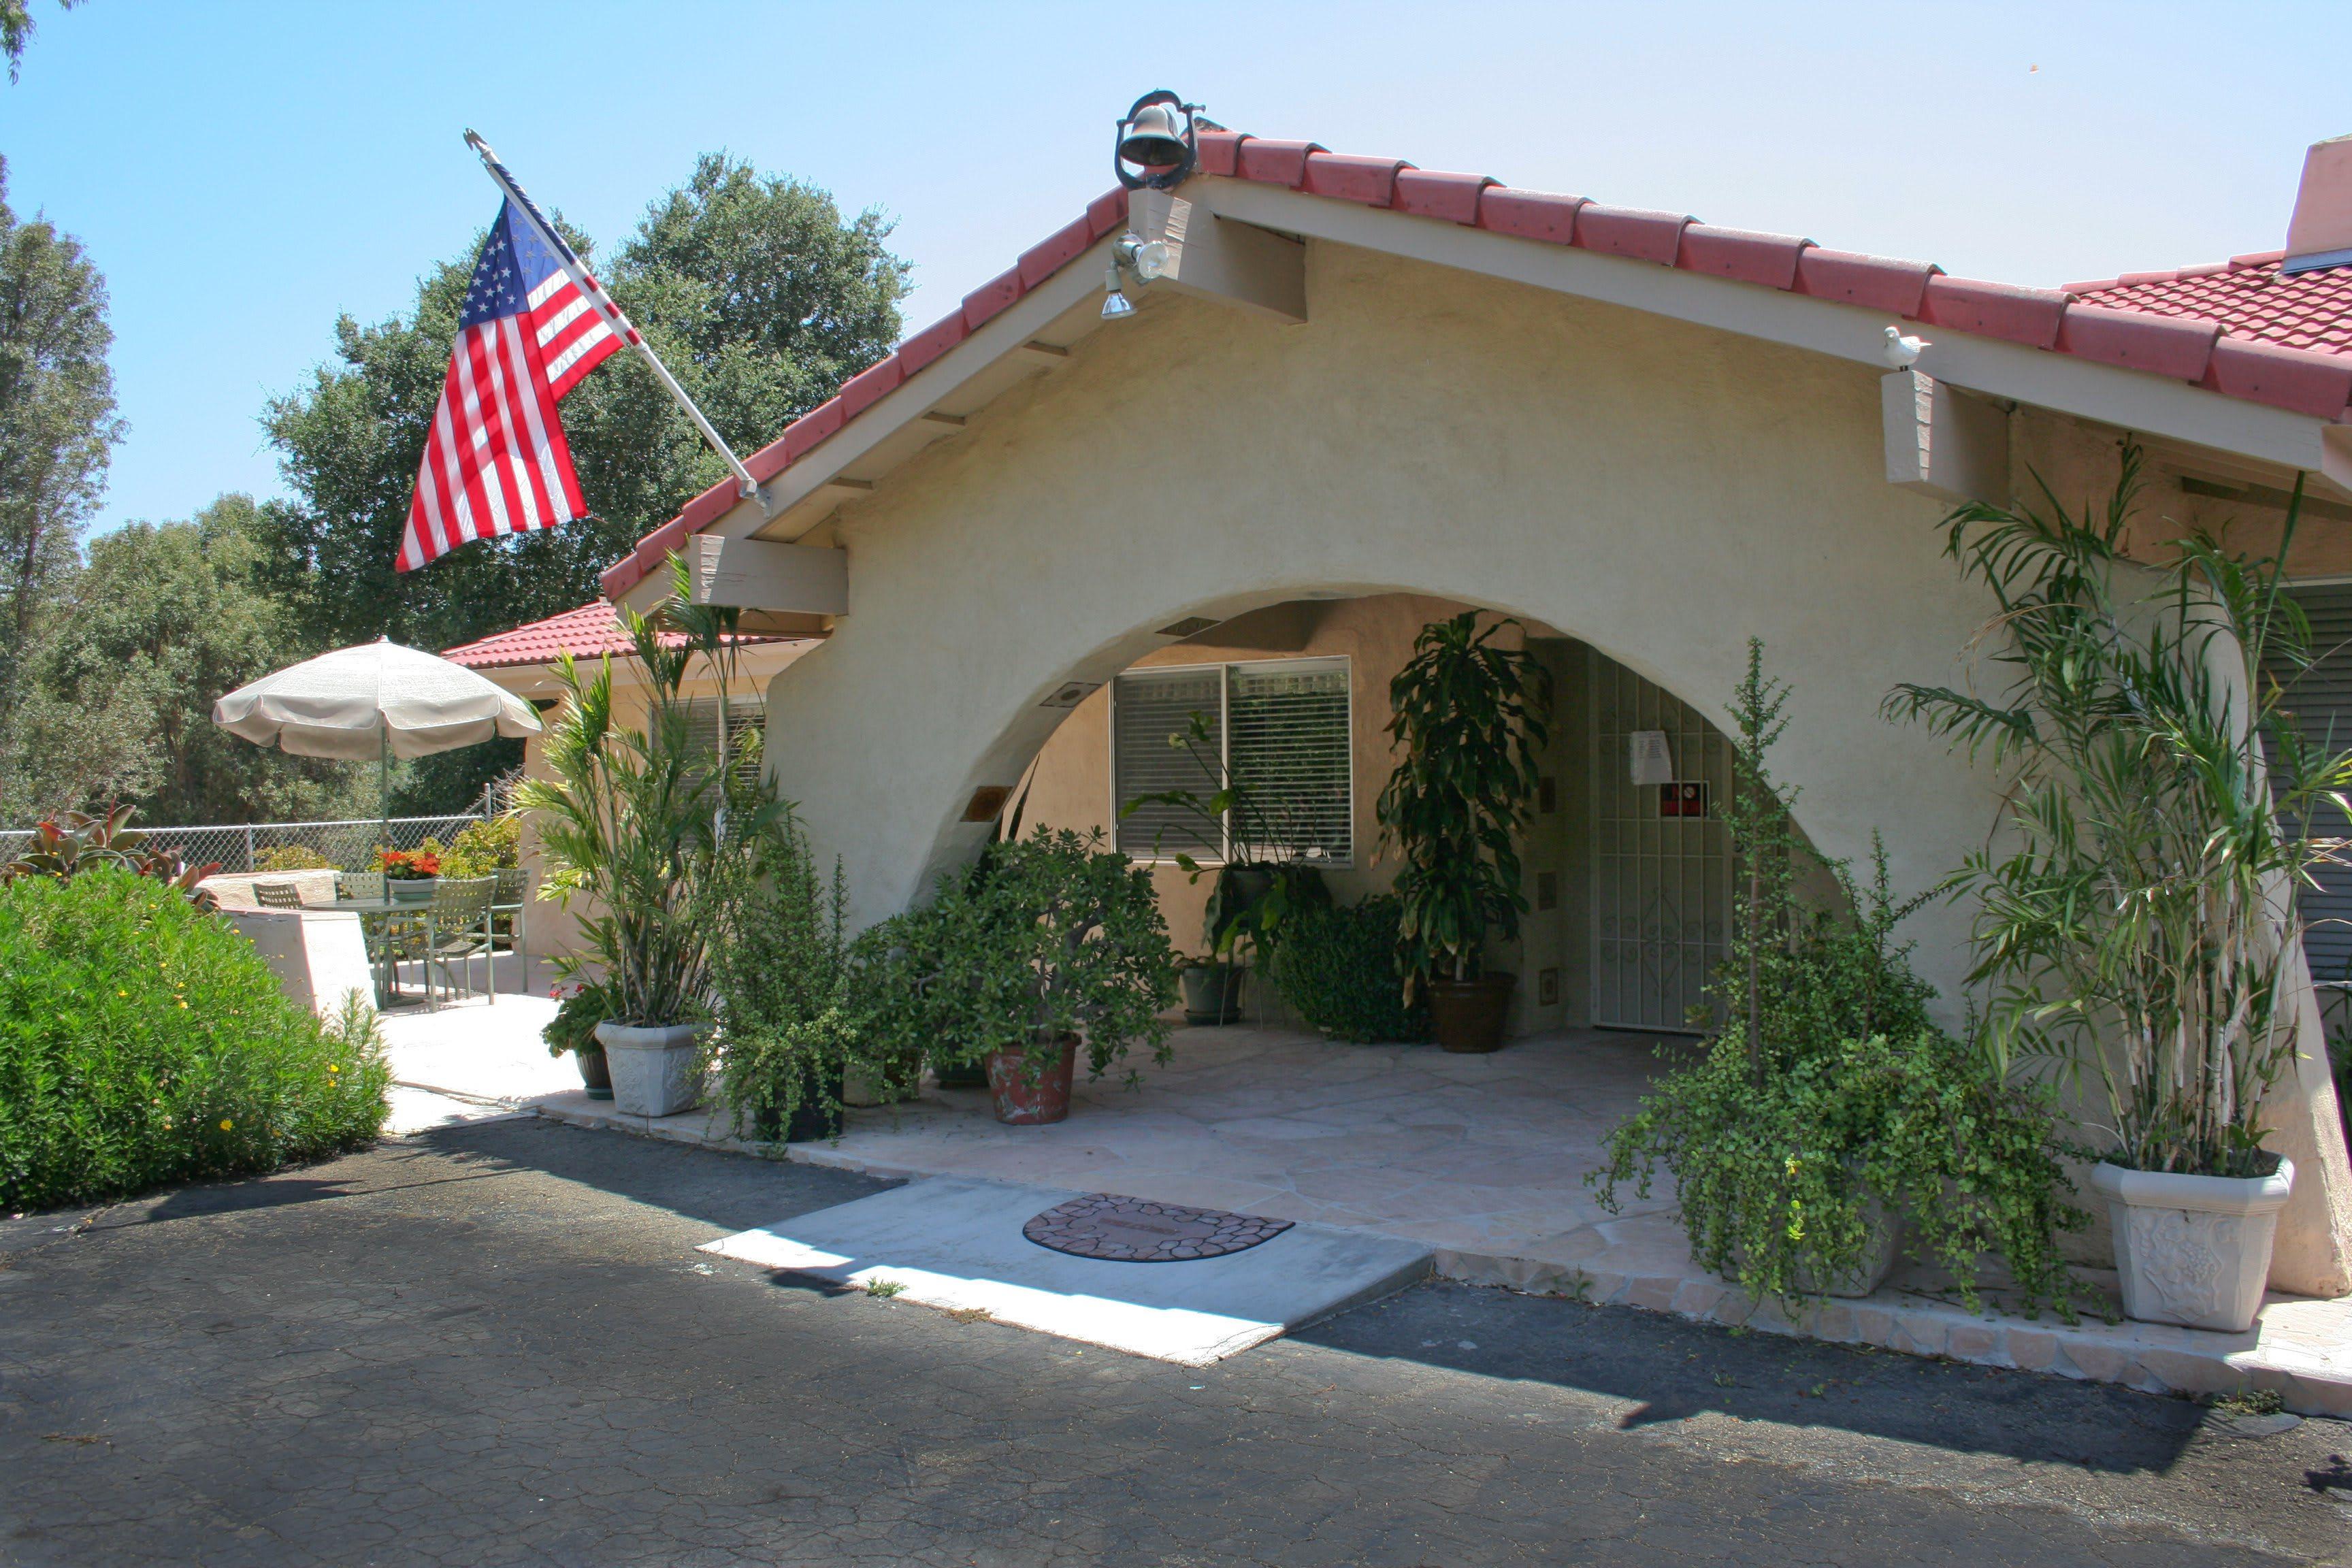 Photo 1 of Citrus Garden Residential Care